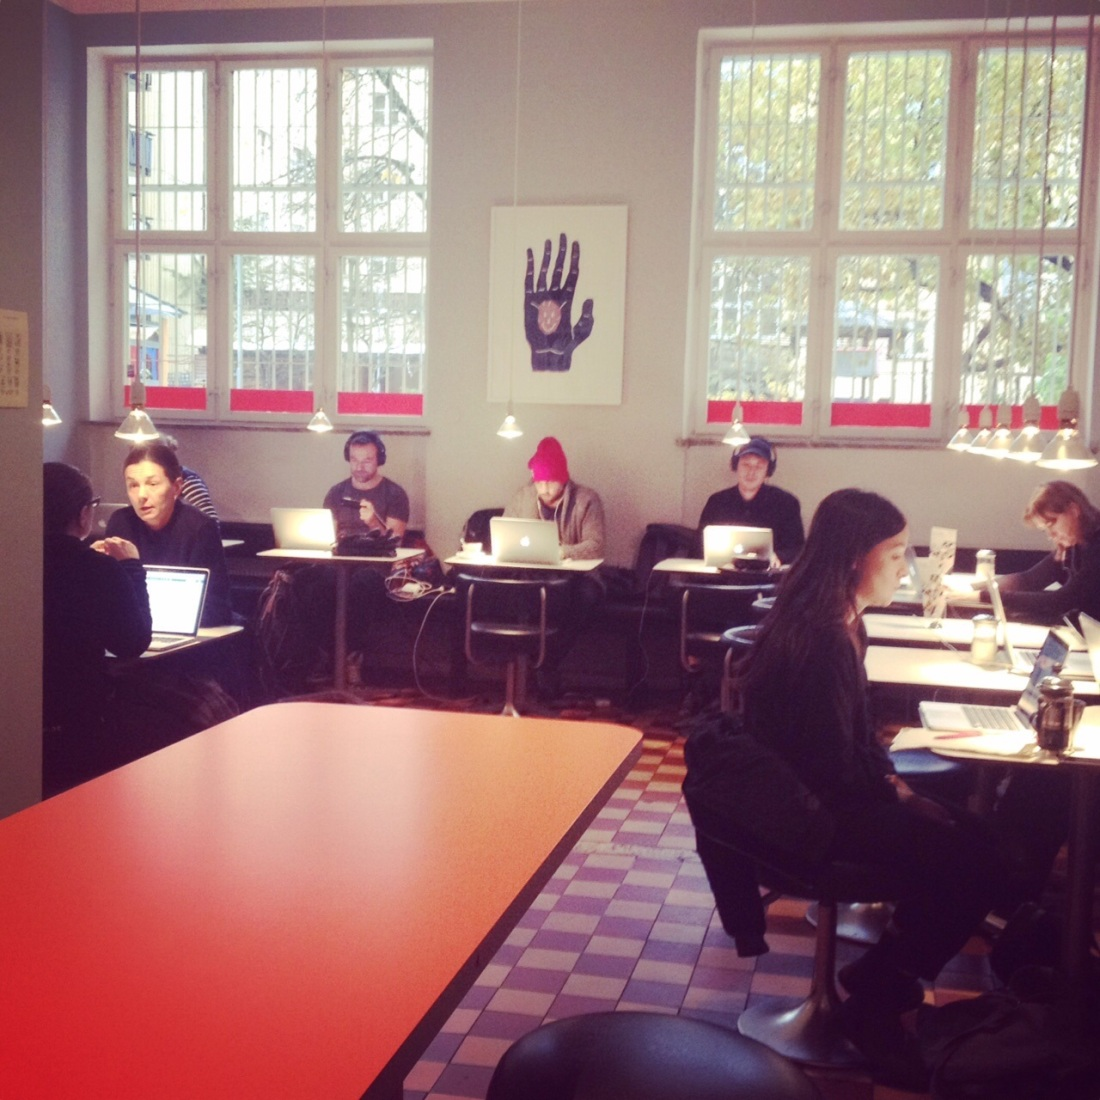 Stockholm, coffee shop, freelancer, freelance life, Il Caffe, Coffice, Fikabaren, Kaffe, Djurgarden, YogaYama, yoga, work